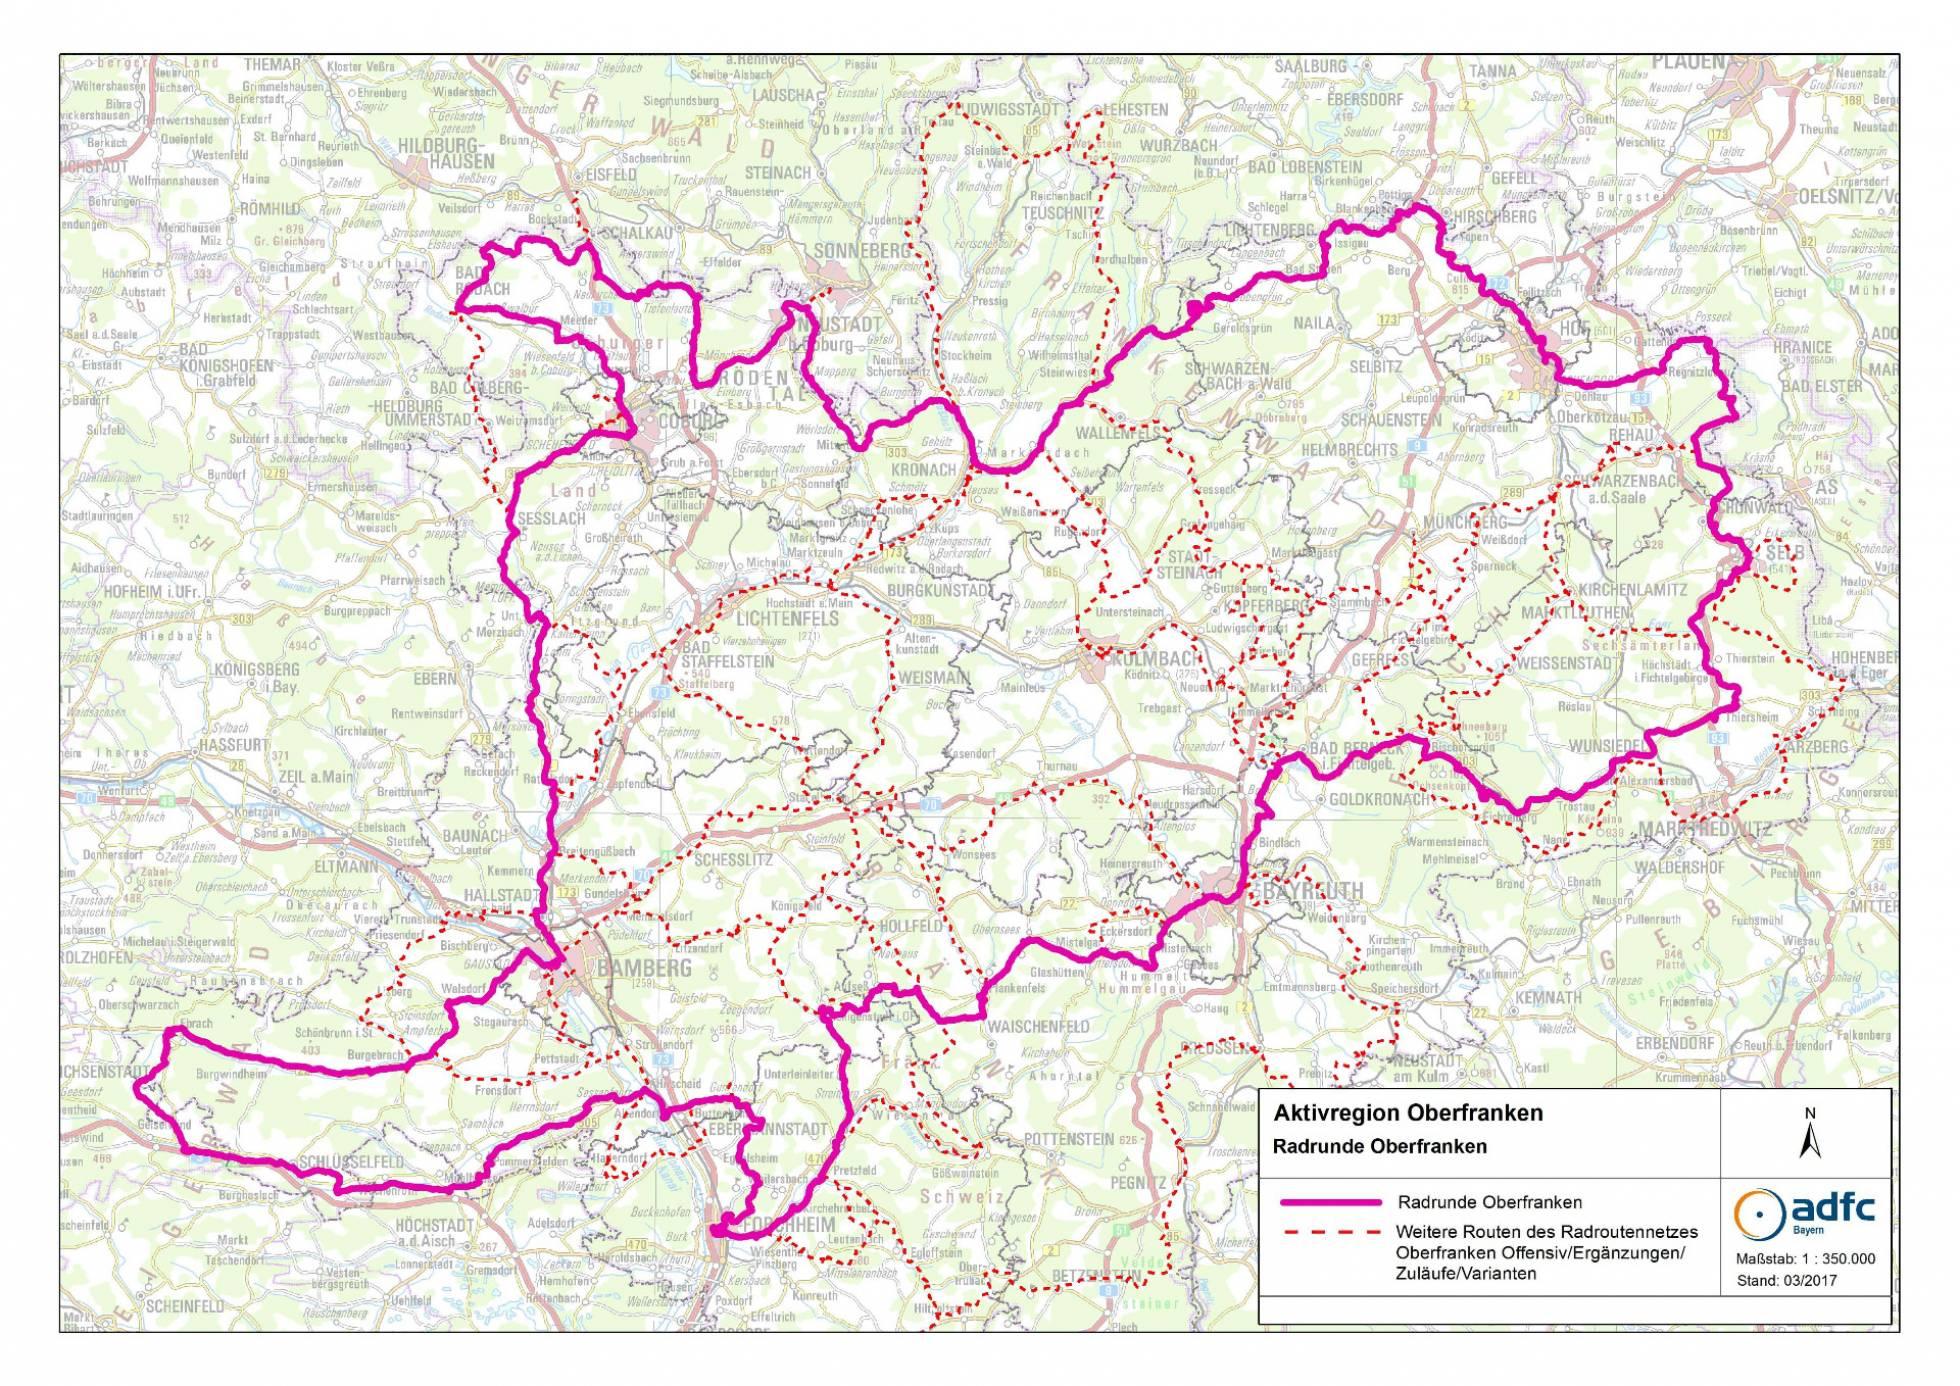 Oberfranken Karte.Radrunde Oberfranken Oberfranken